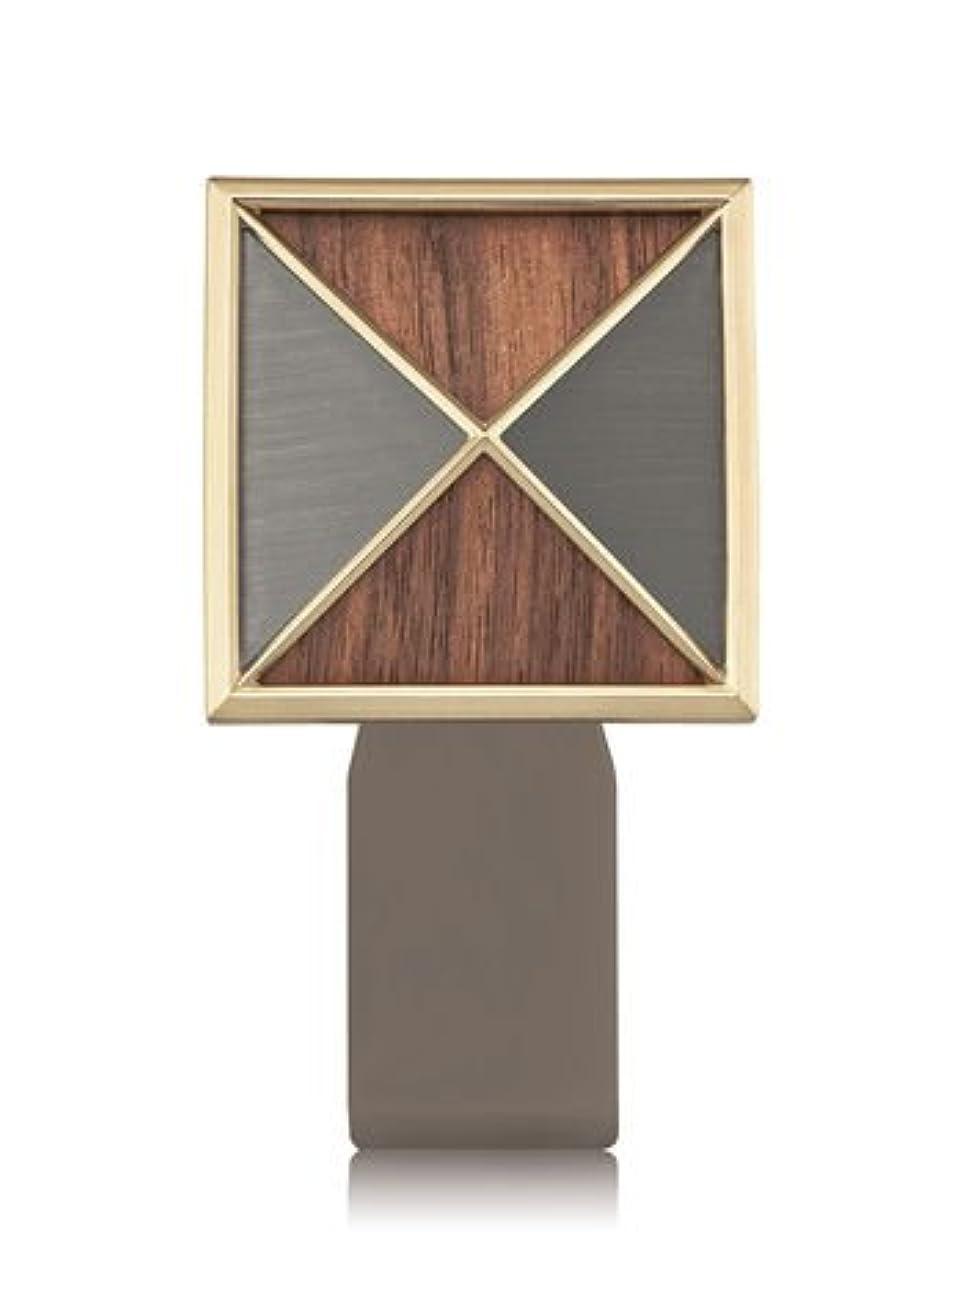 【Bath&Body Works/バス&ボディワークス】 ルームフレグランス プラグインスターター (本体のみ) テクスチャーシールド Wallflowers Fragrance Plug Textured Shield...